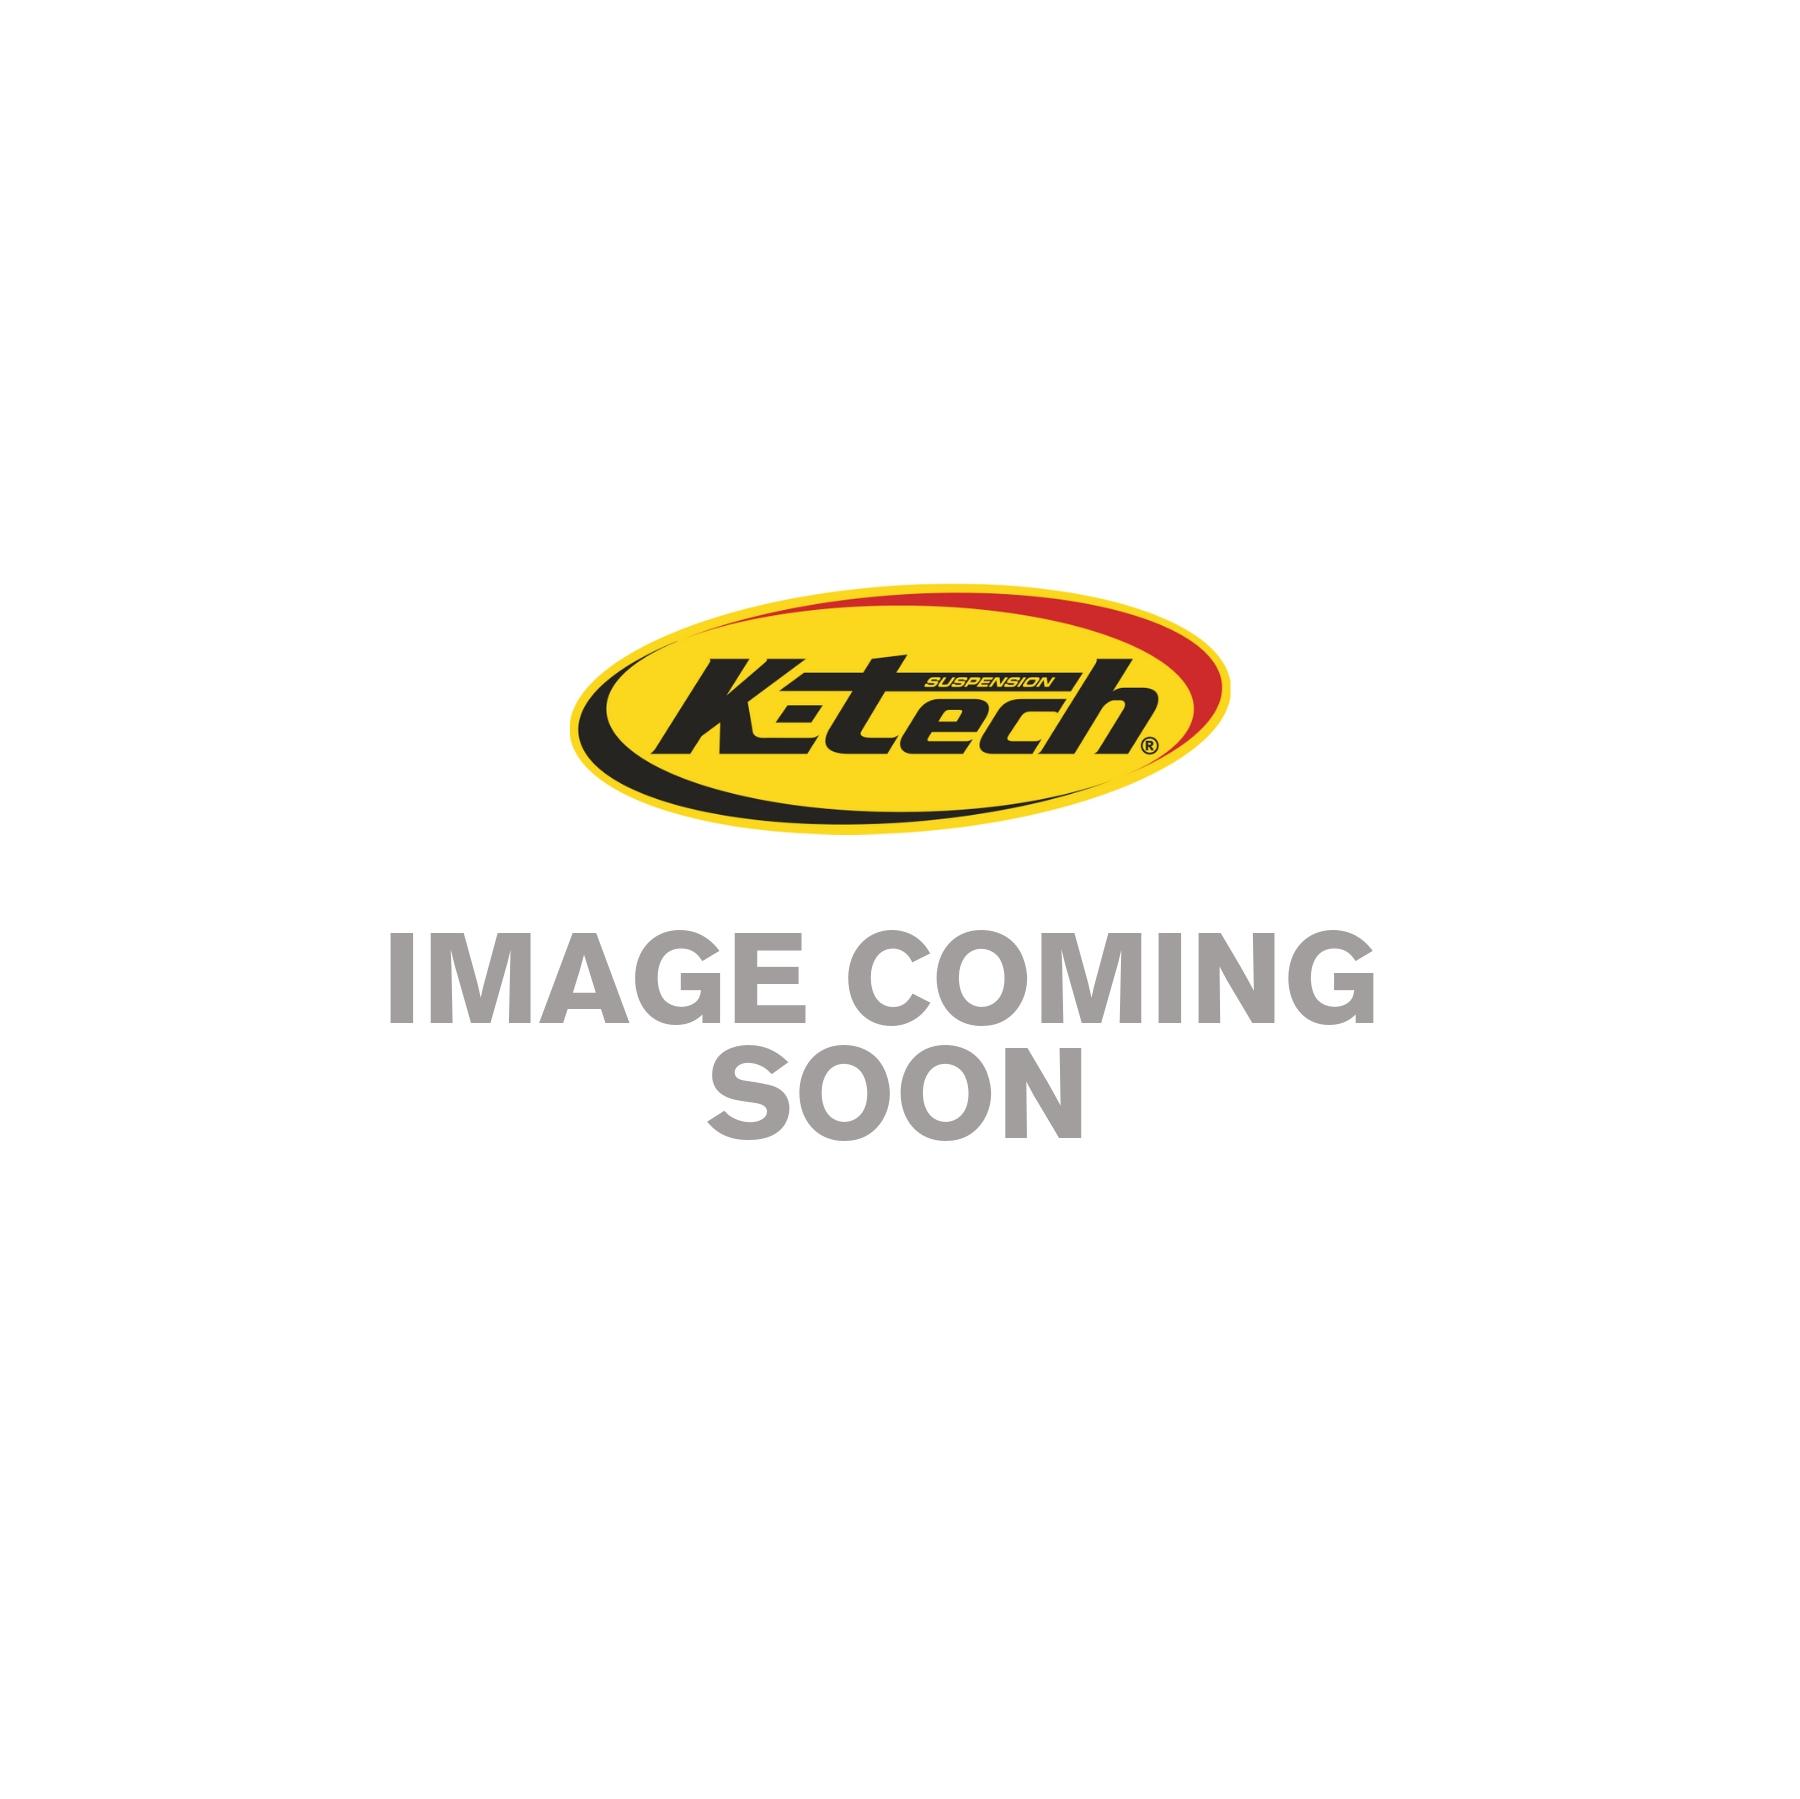 RDS Front Fork Cartridges Triumph Daytona 675 2009-2012 KYB